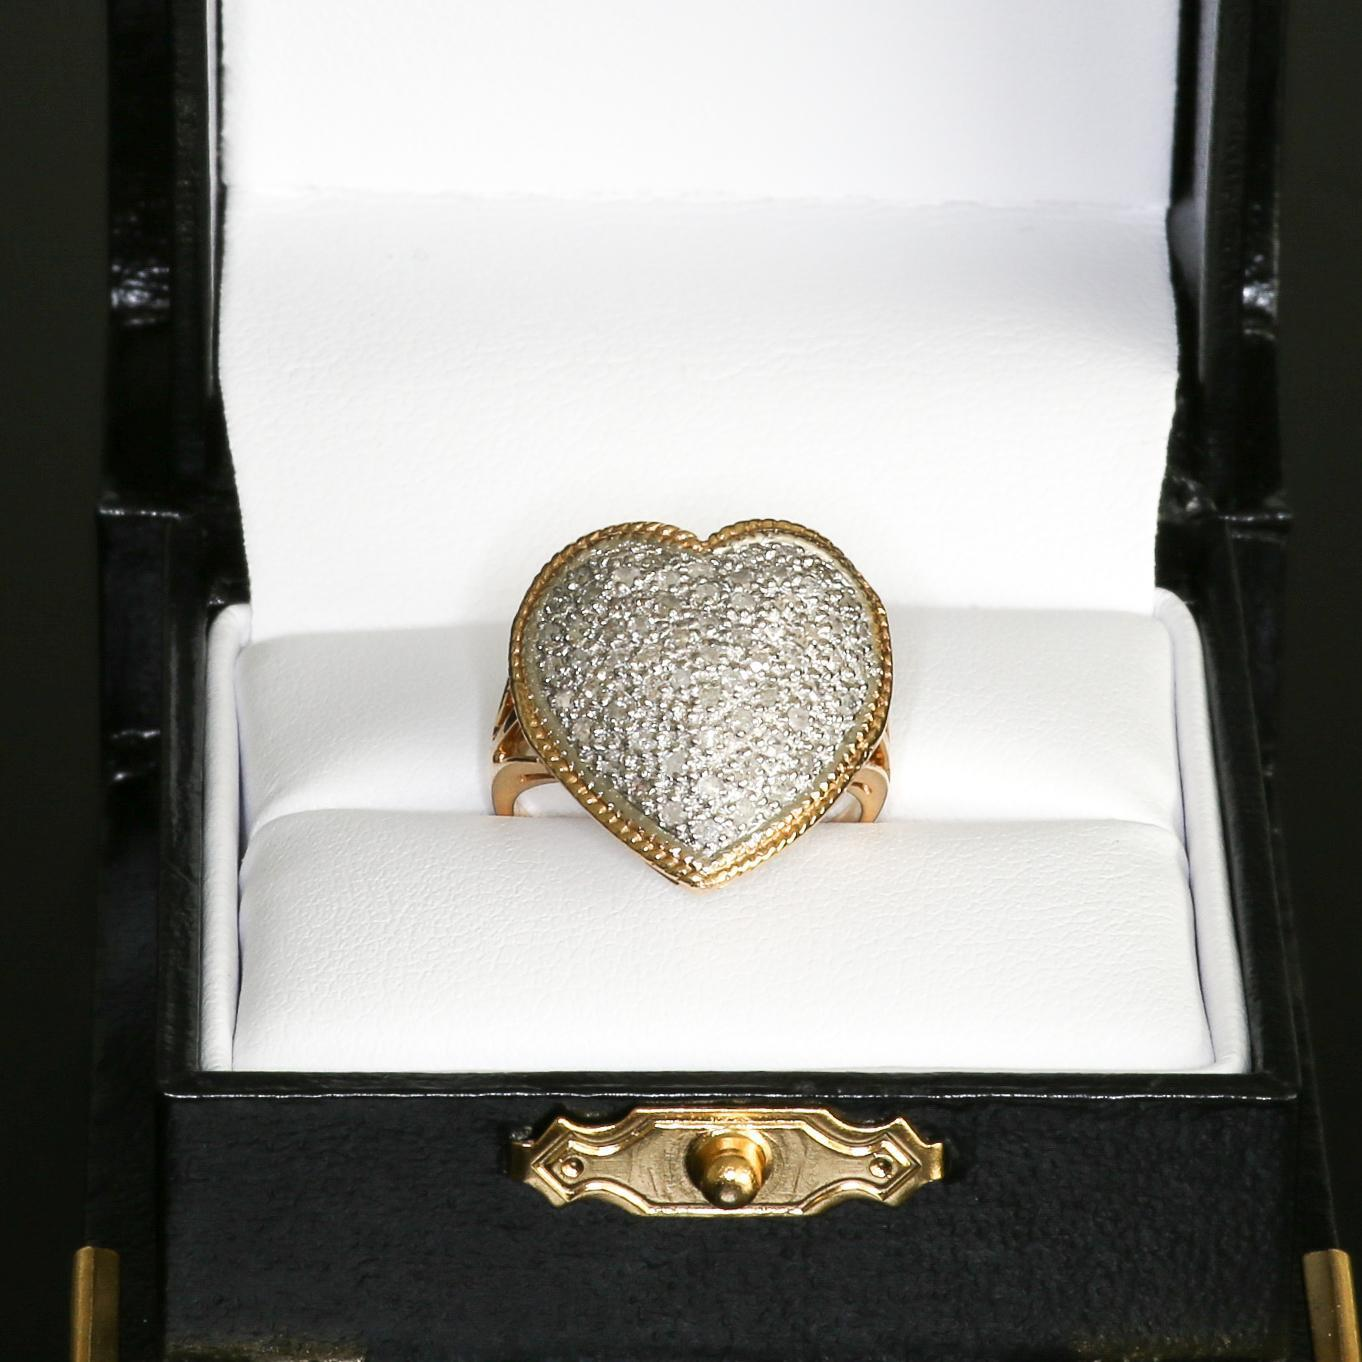 Lady's Vintage 14K Pave Diamond Heart Shaped Ring